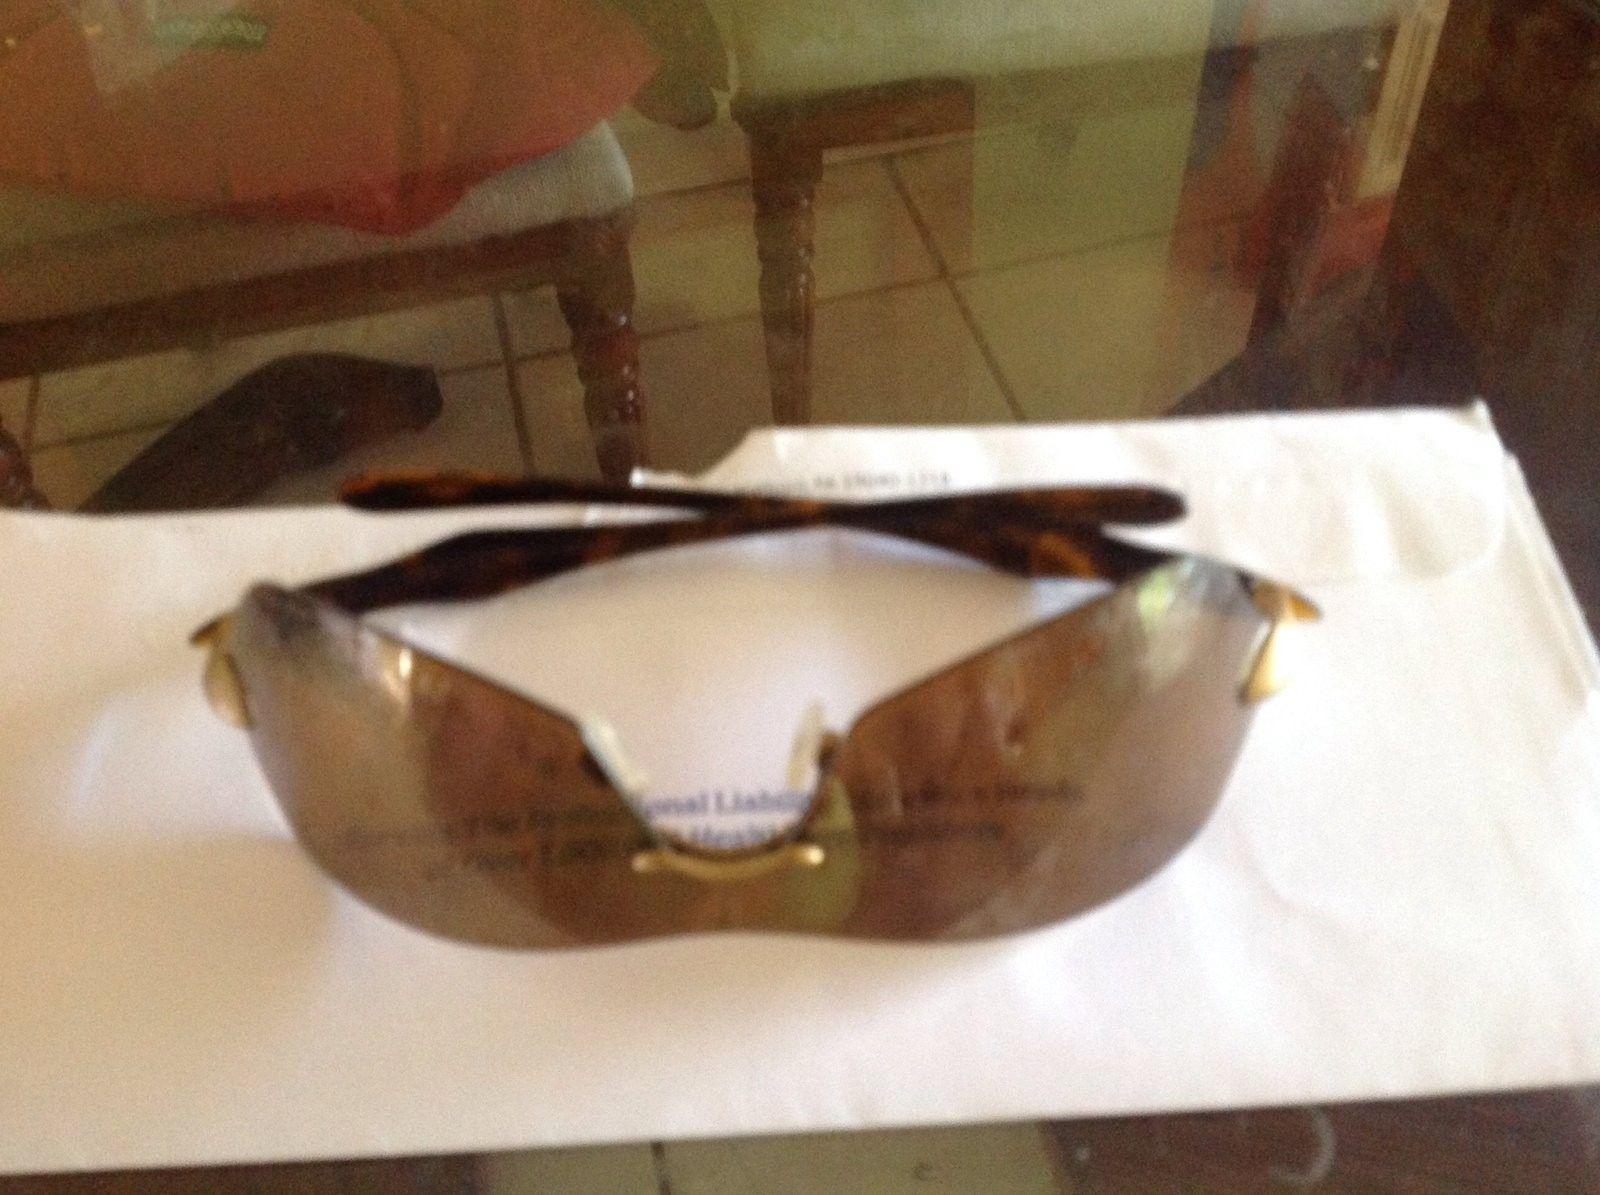 Need help ID Oakley sunglasses - image.jpg